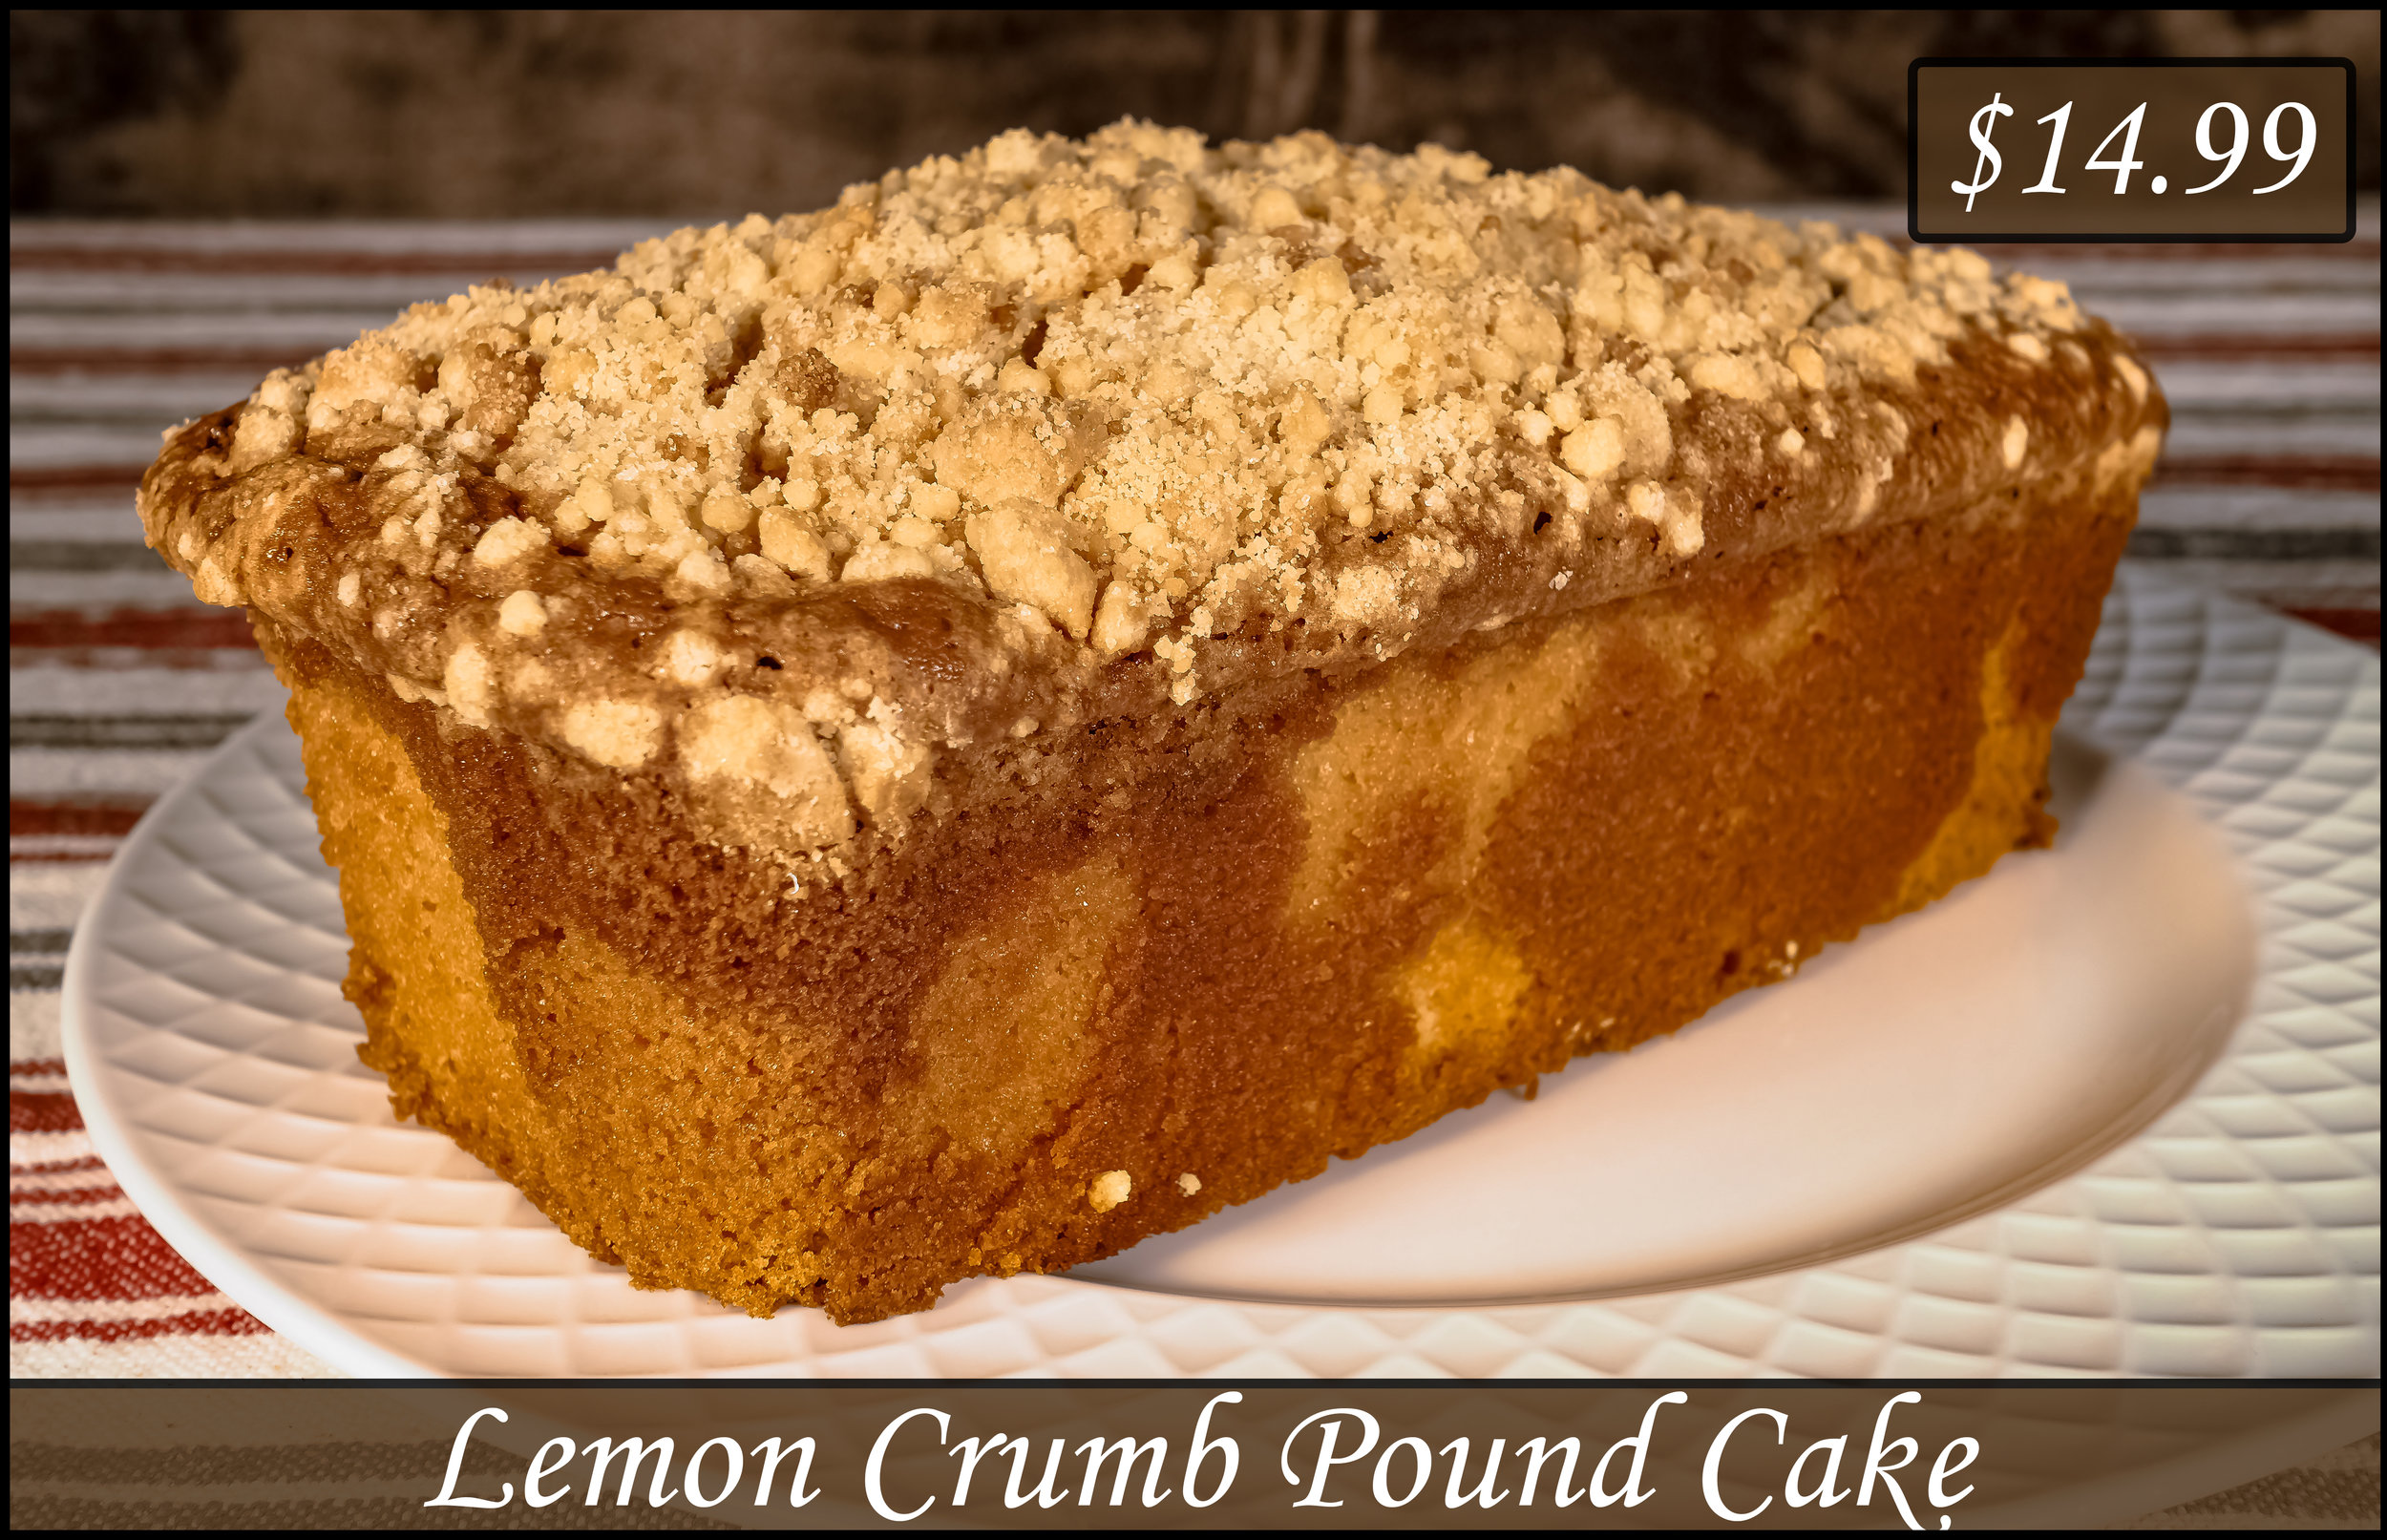 Lemon Crumb Pound Cake.jpg